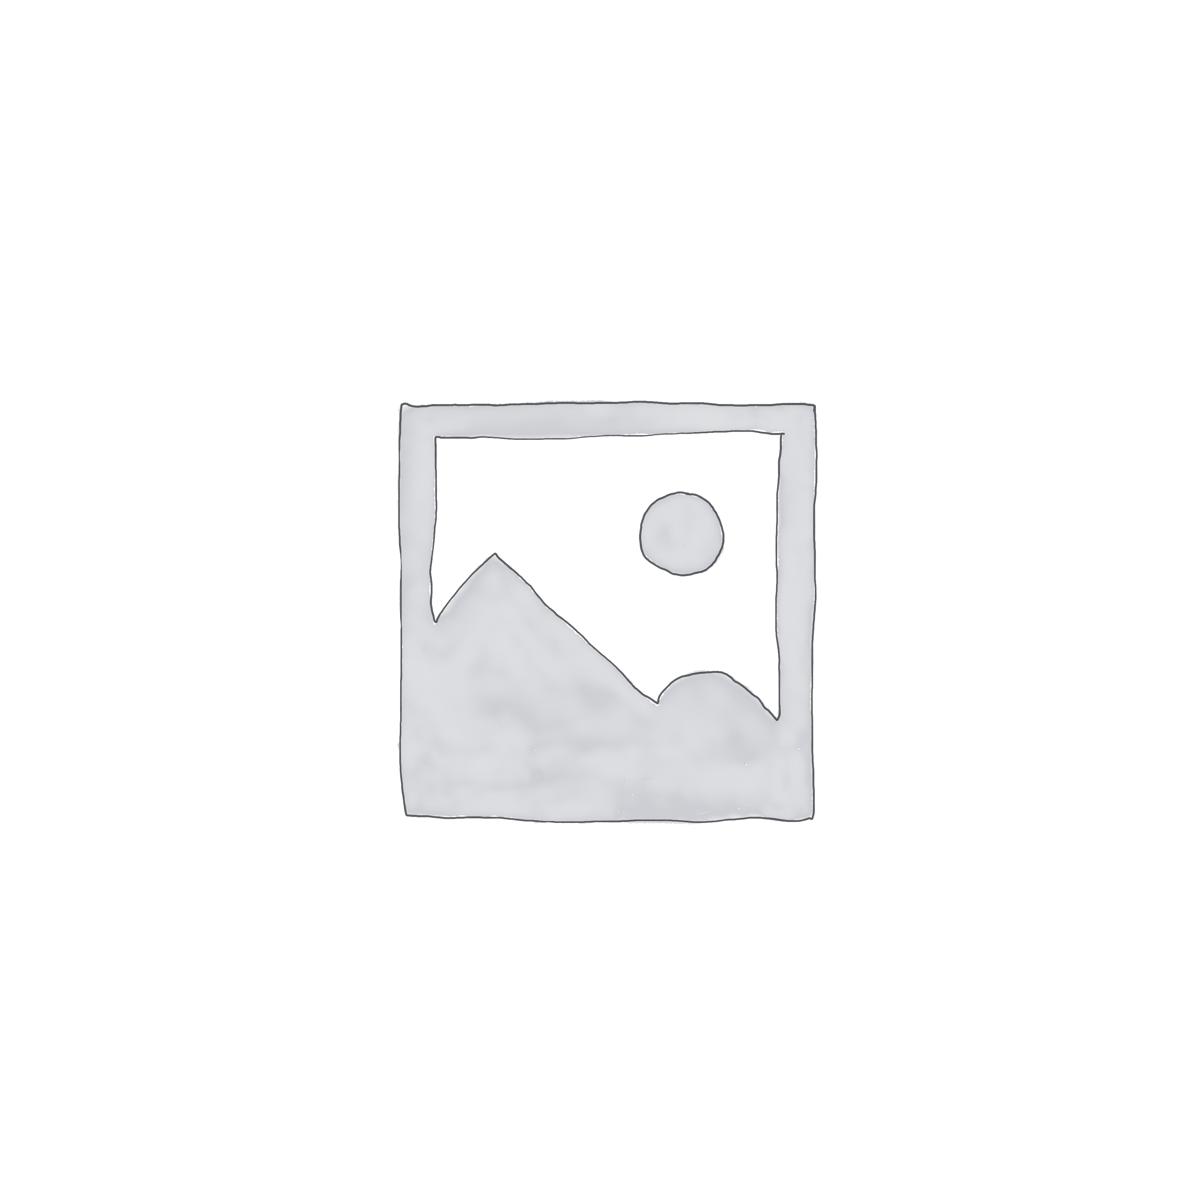 Nursery Snowy Landscape with Cute Cartoon Animals Wallpaper Mural